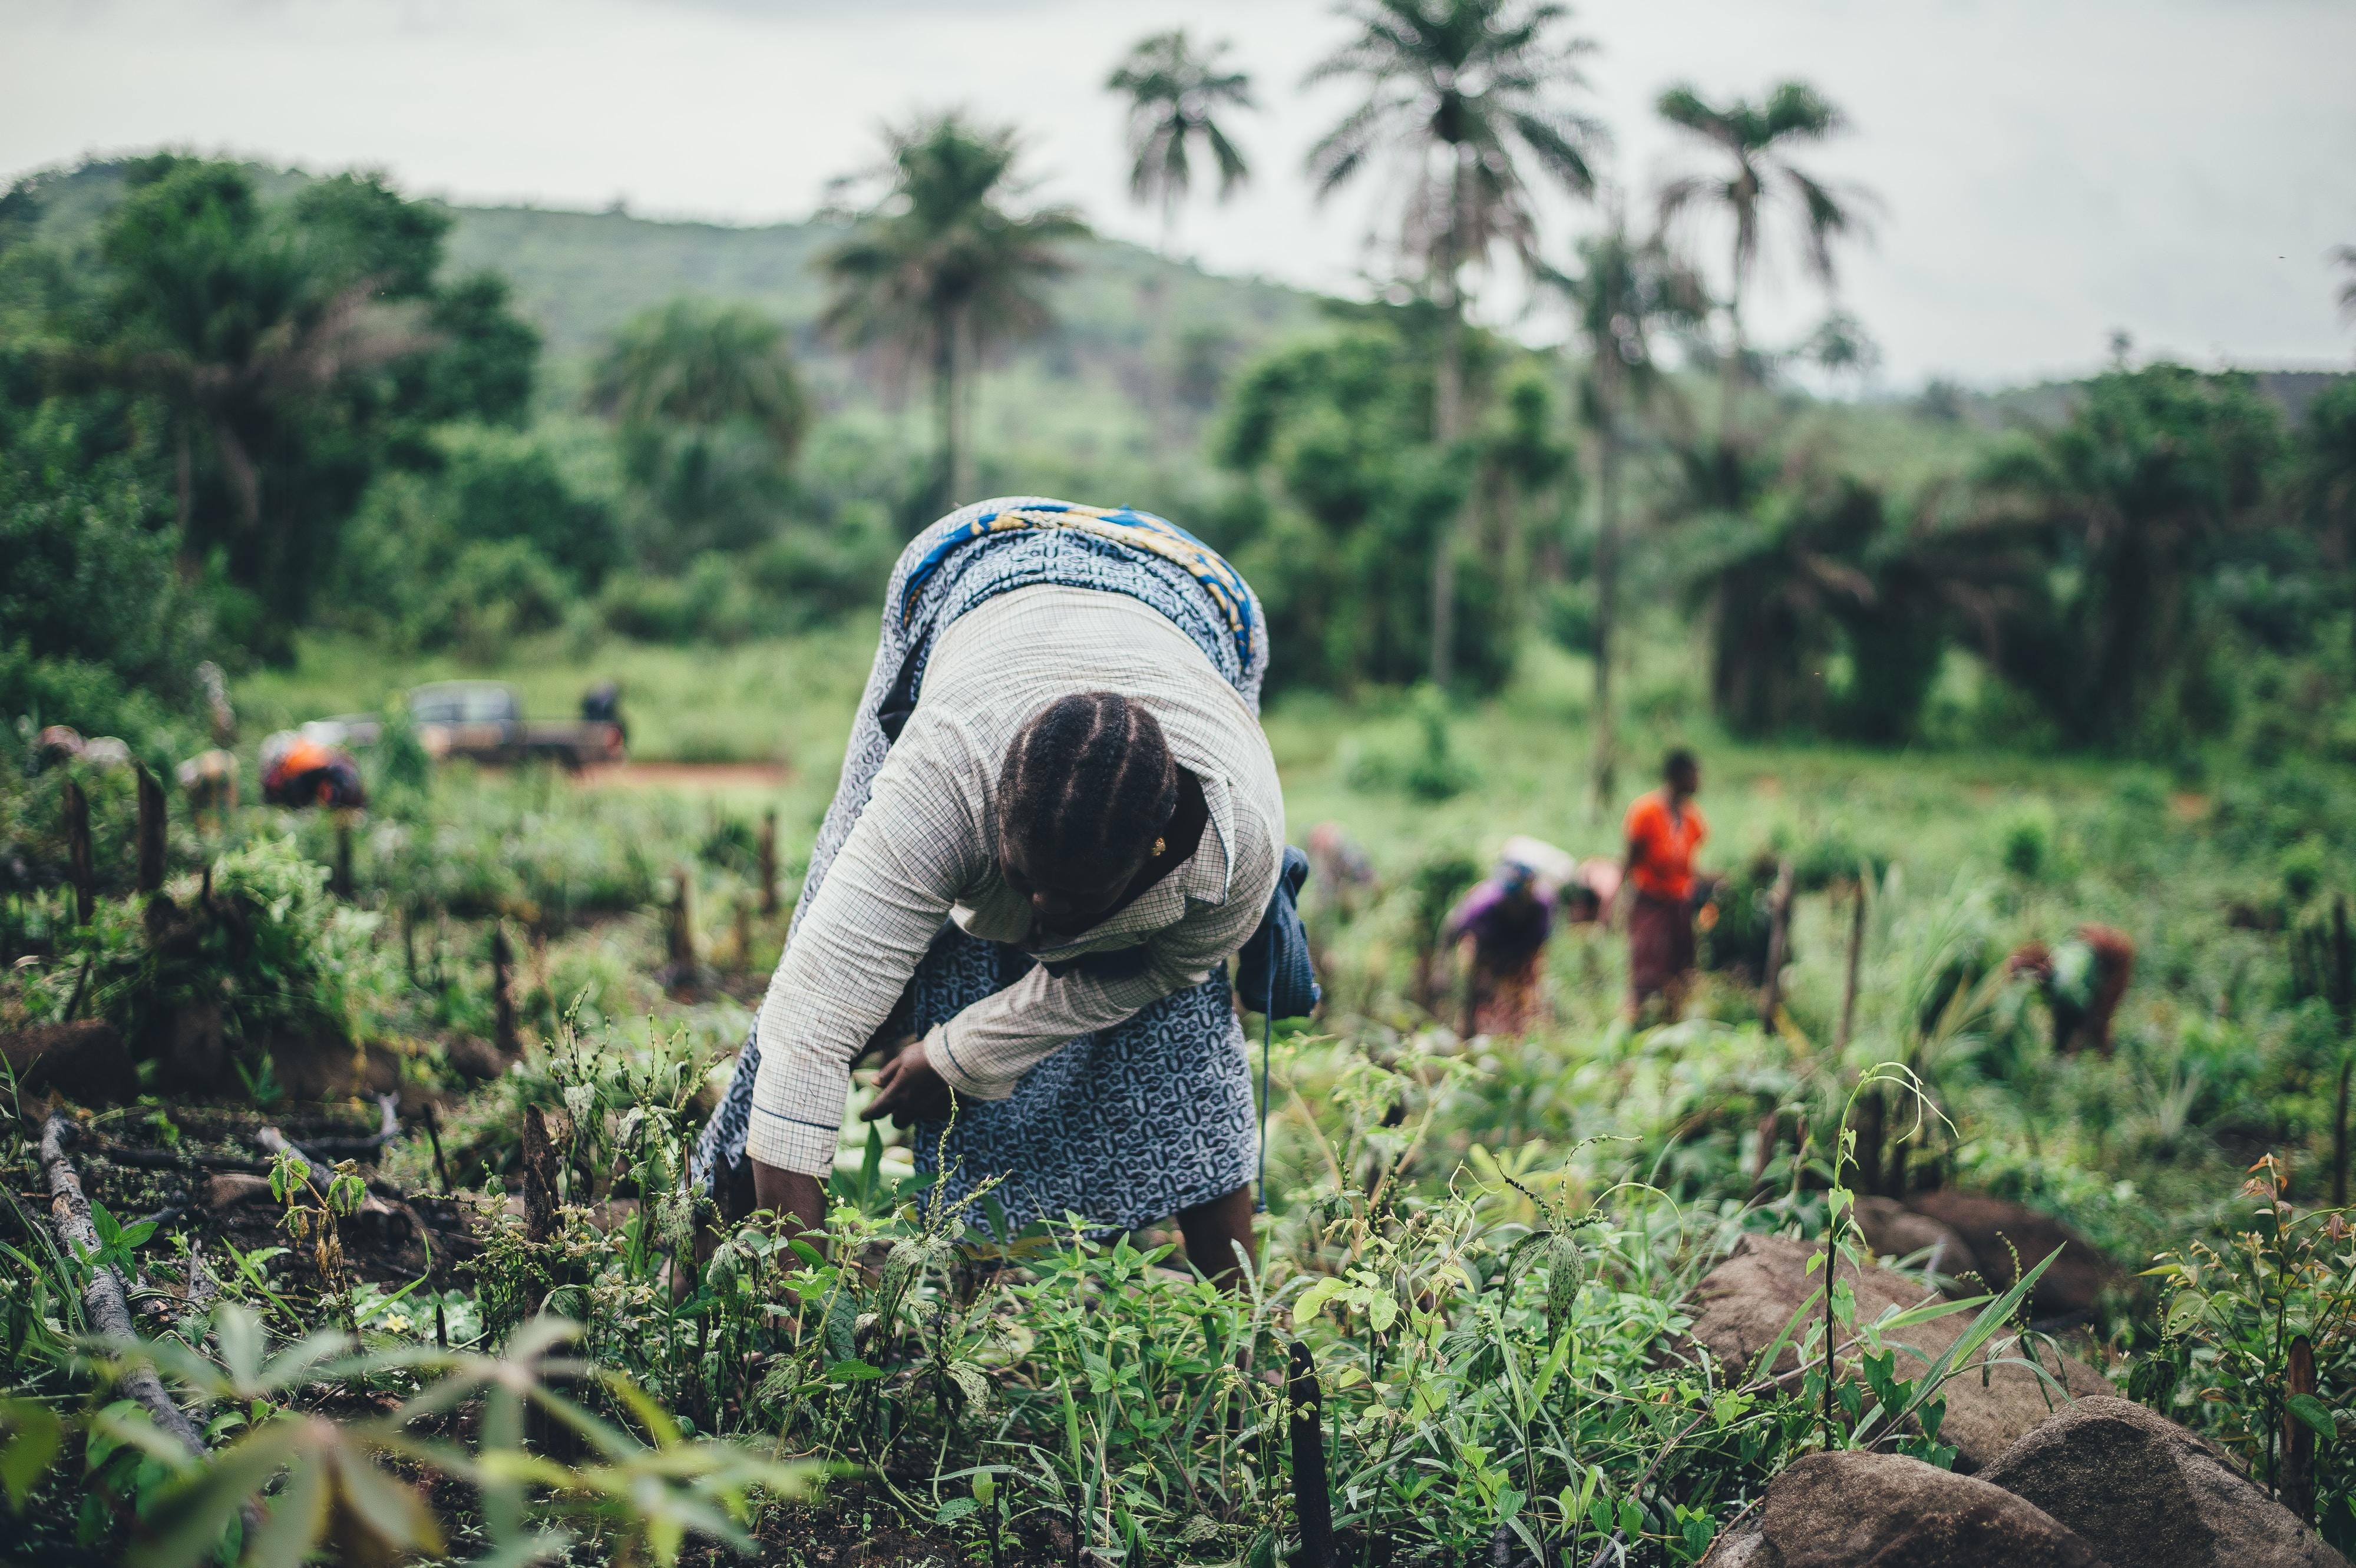 woman planting during daytime